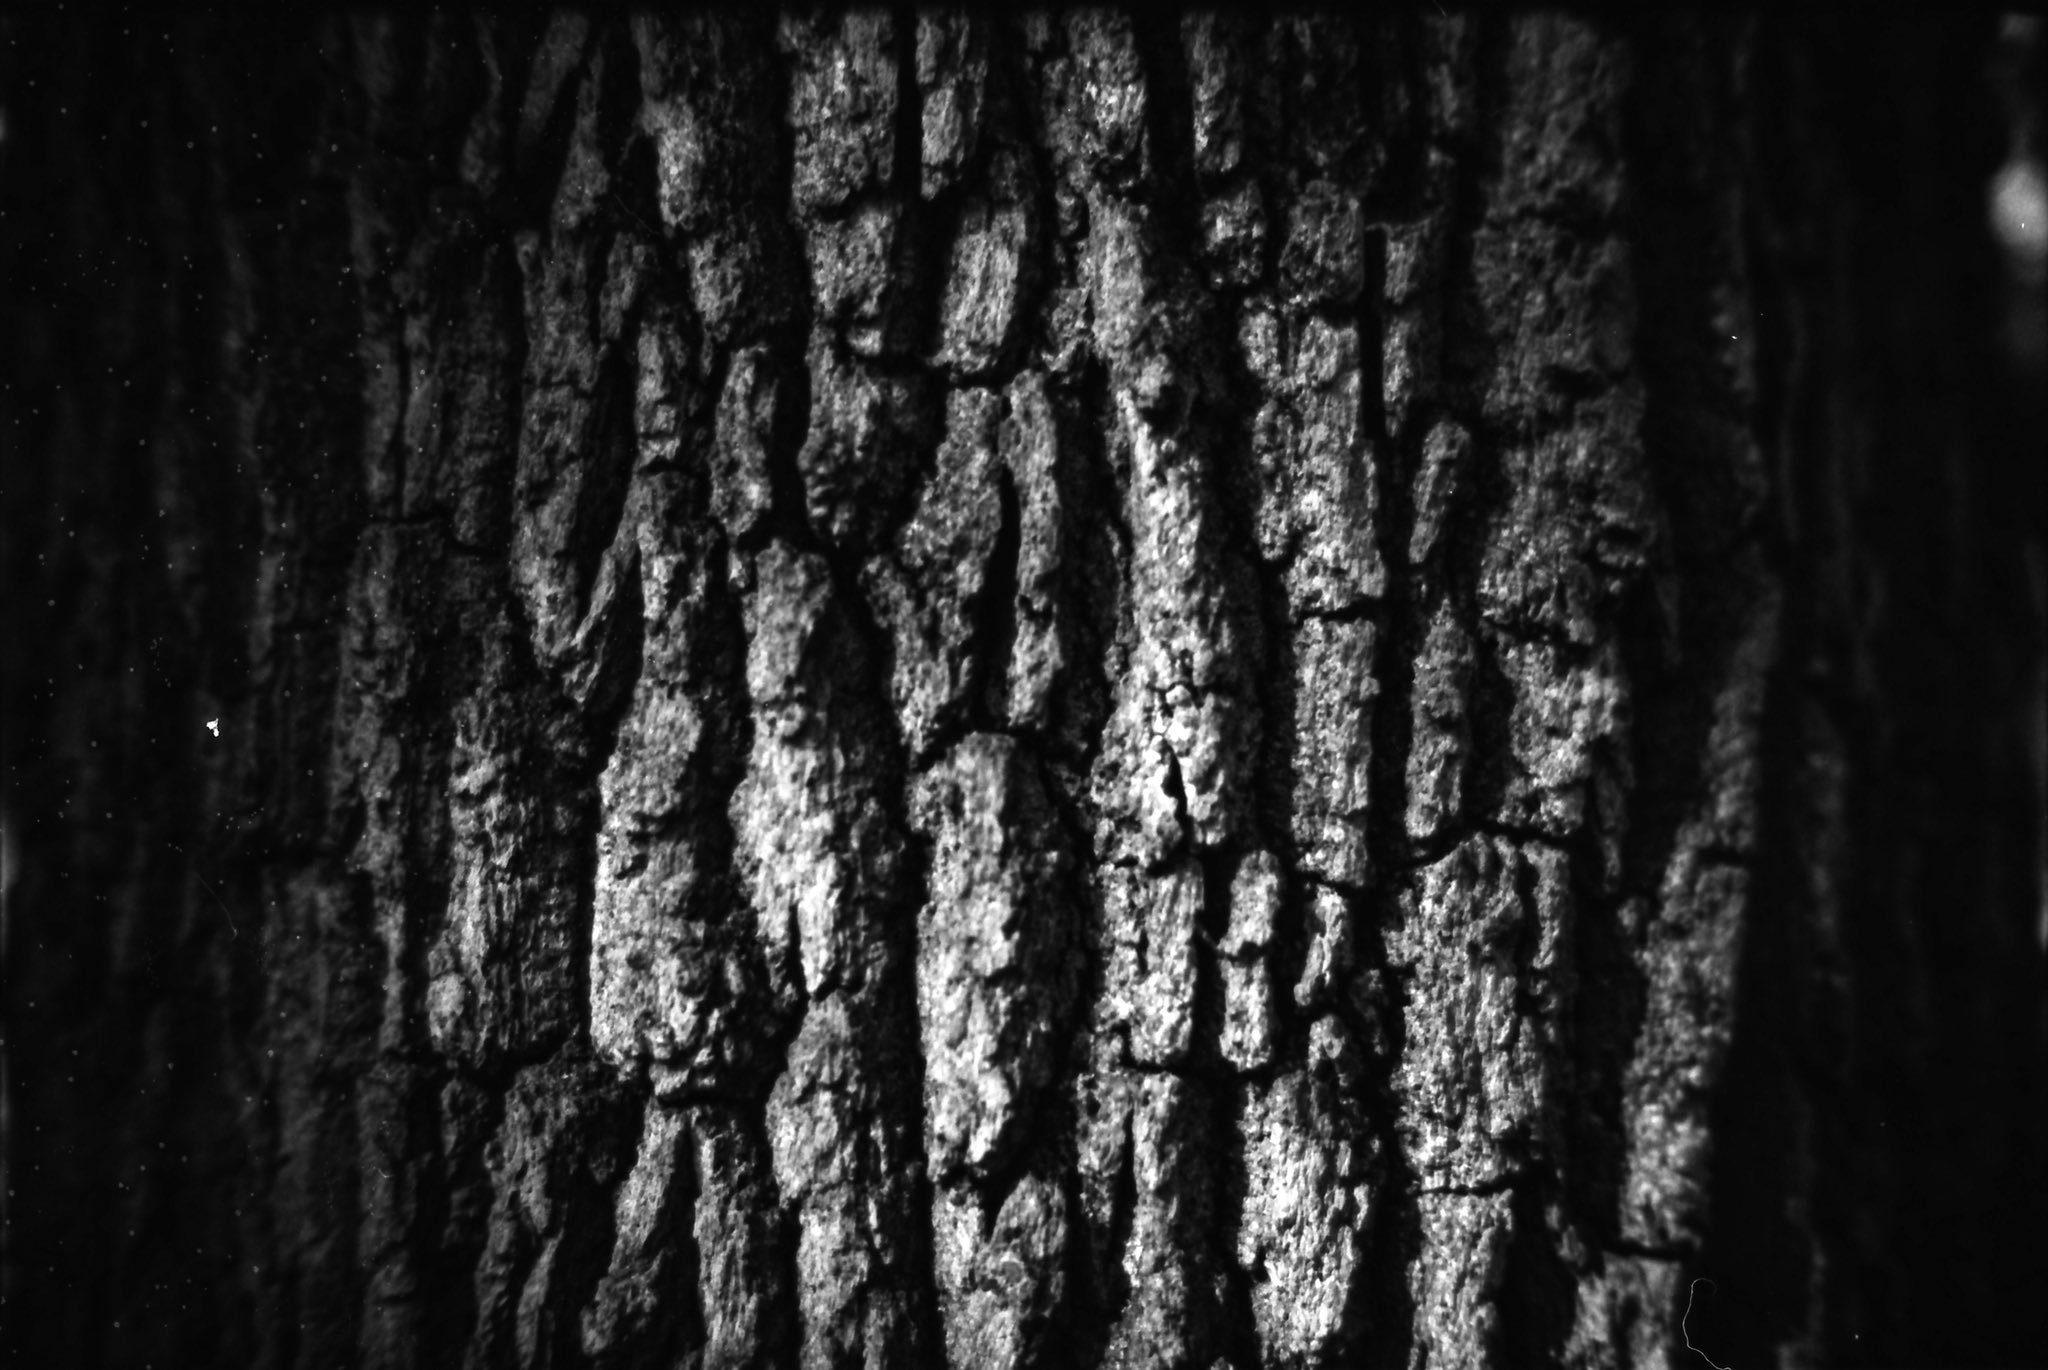 @AdibMufty · Oct 2 Nature's patterns 📷: Leica M6 🎞: Ilford PanF 50 ⚗️: CineStill DF96 #blackandwhitephotography #BelieveInFilm #filmphotography #ilfordphoto #fridayfavourites #patterns